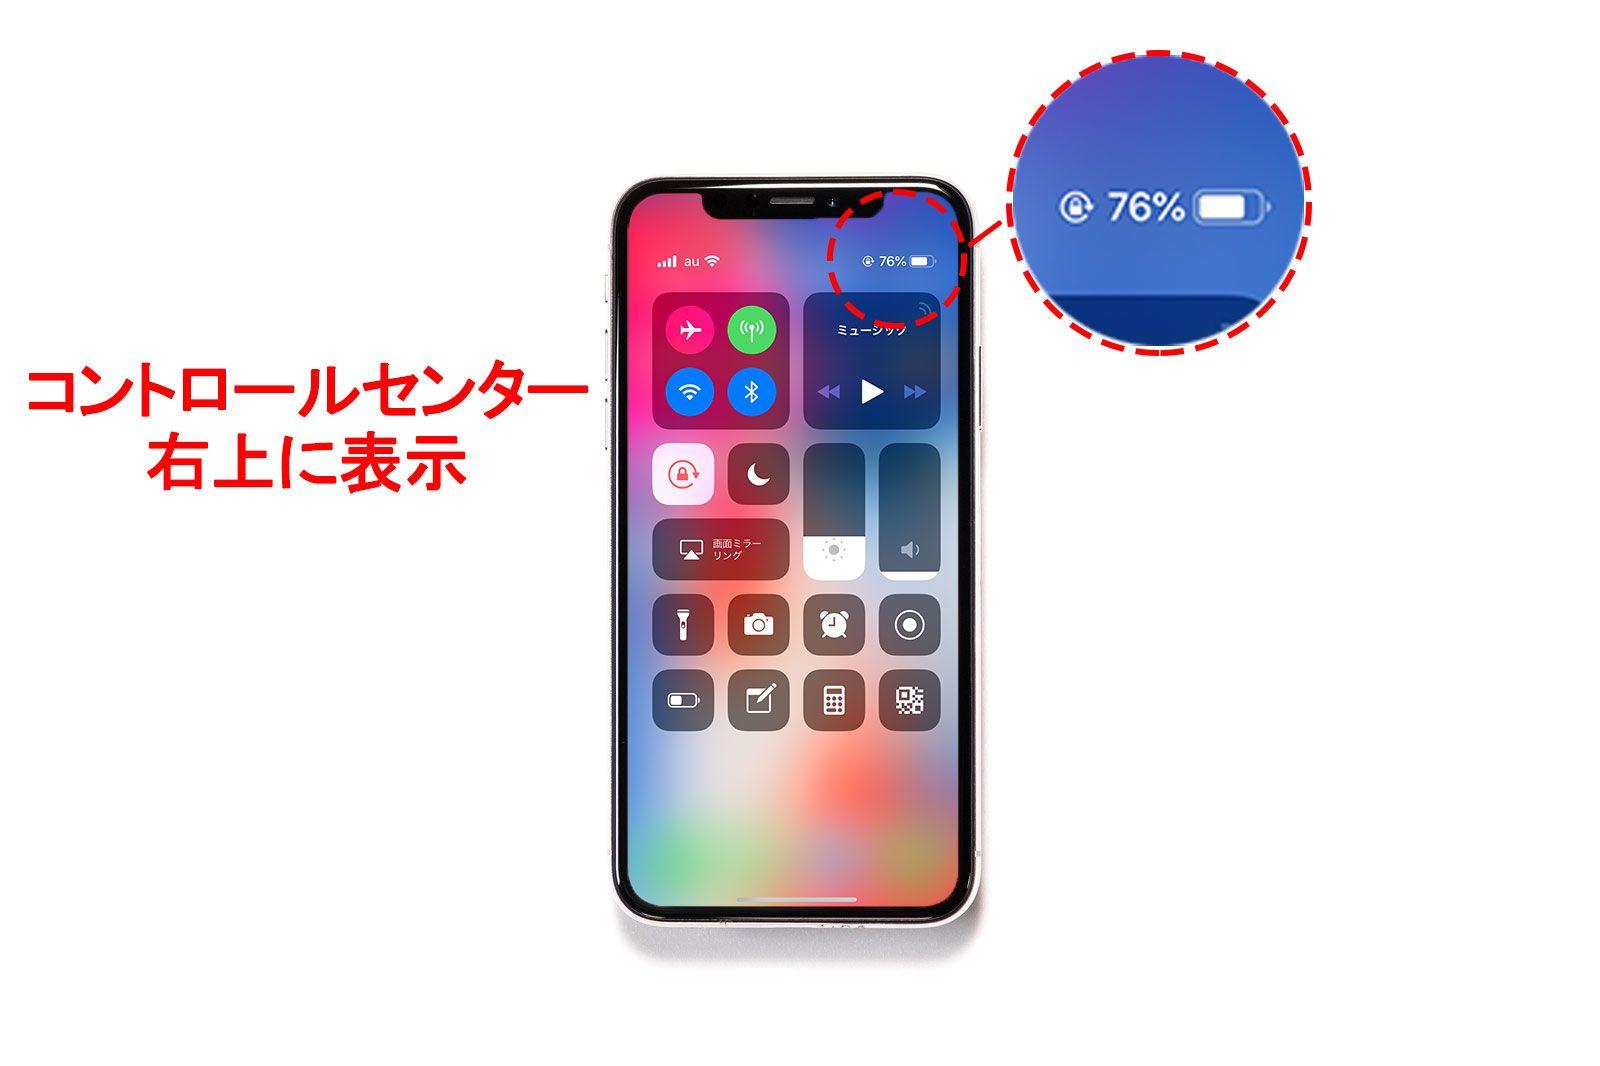 iPhone Xシリーズ 充電の残量%の確認